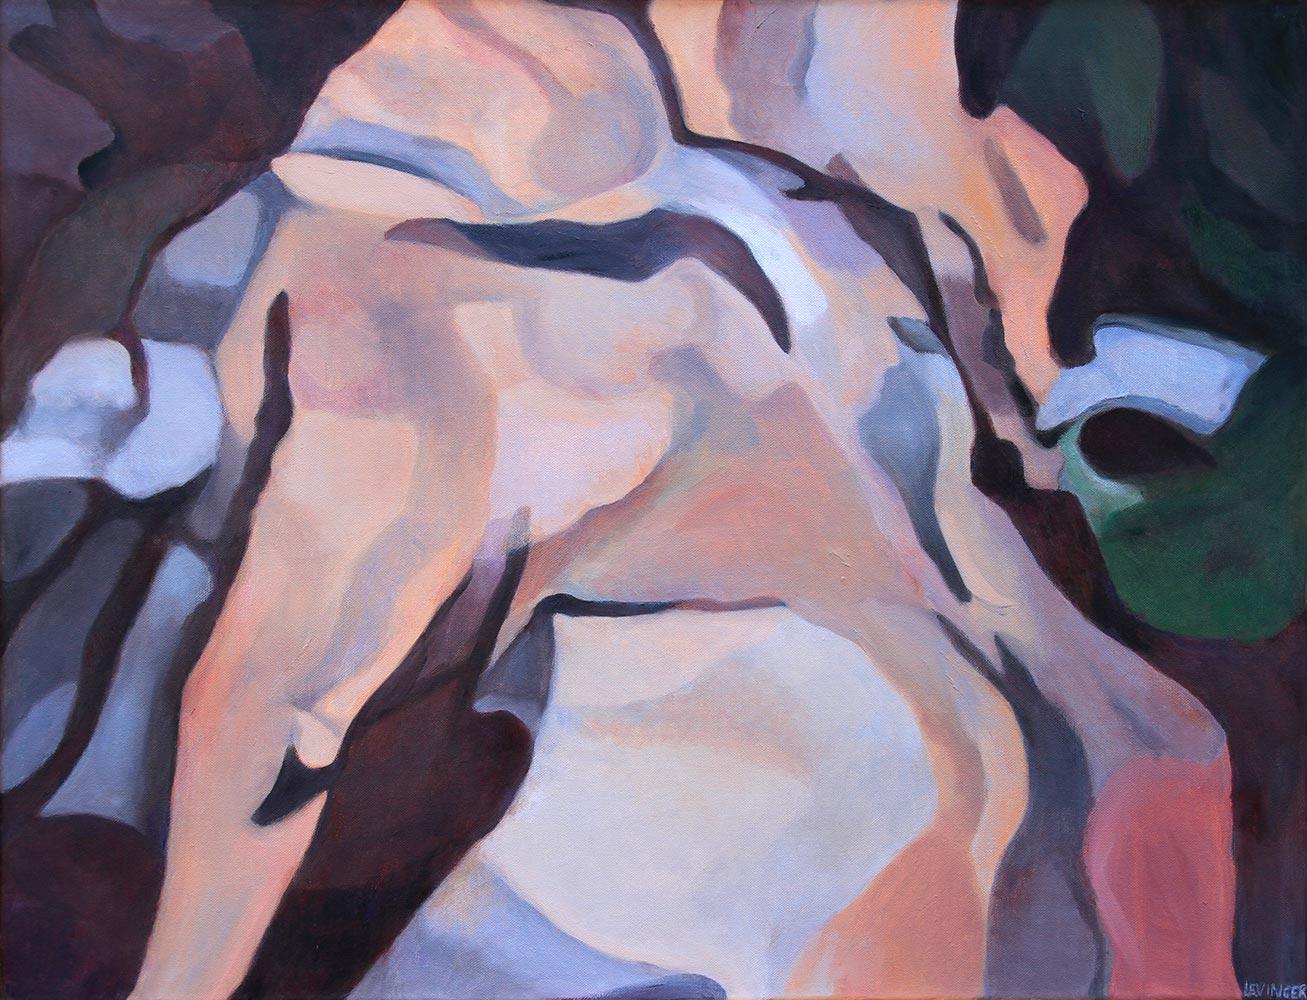 Torso, 90 x 120 cm, Öl auf Leinwand